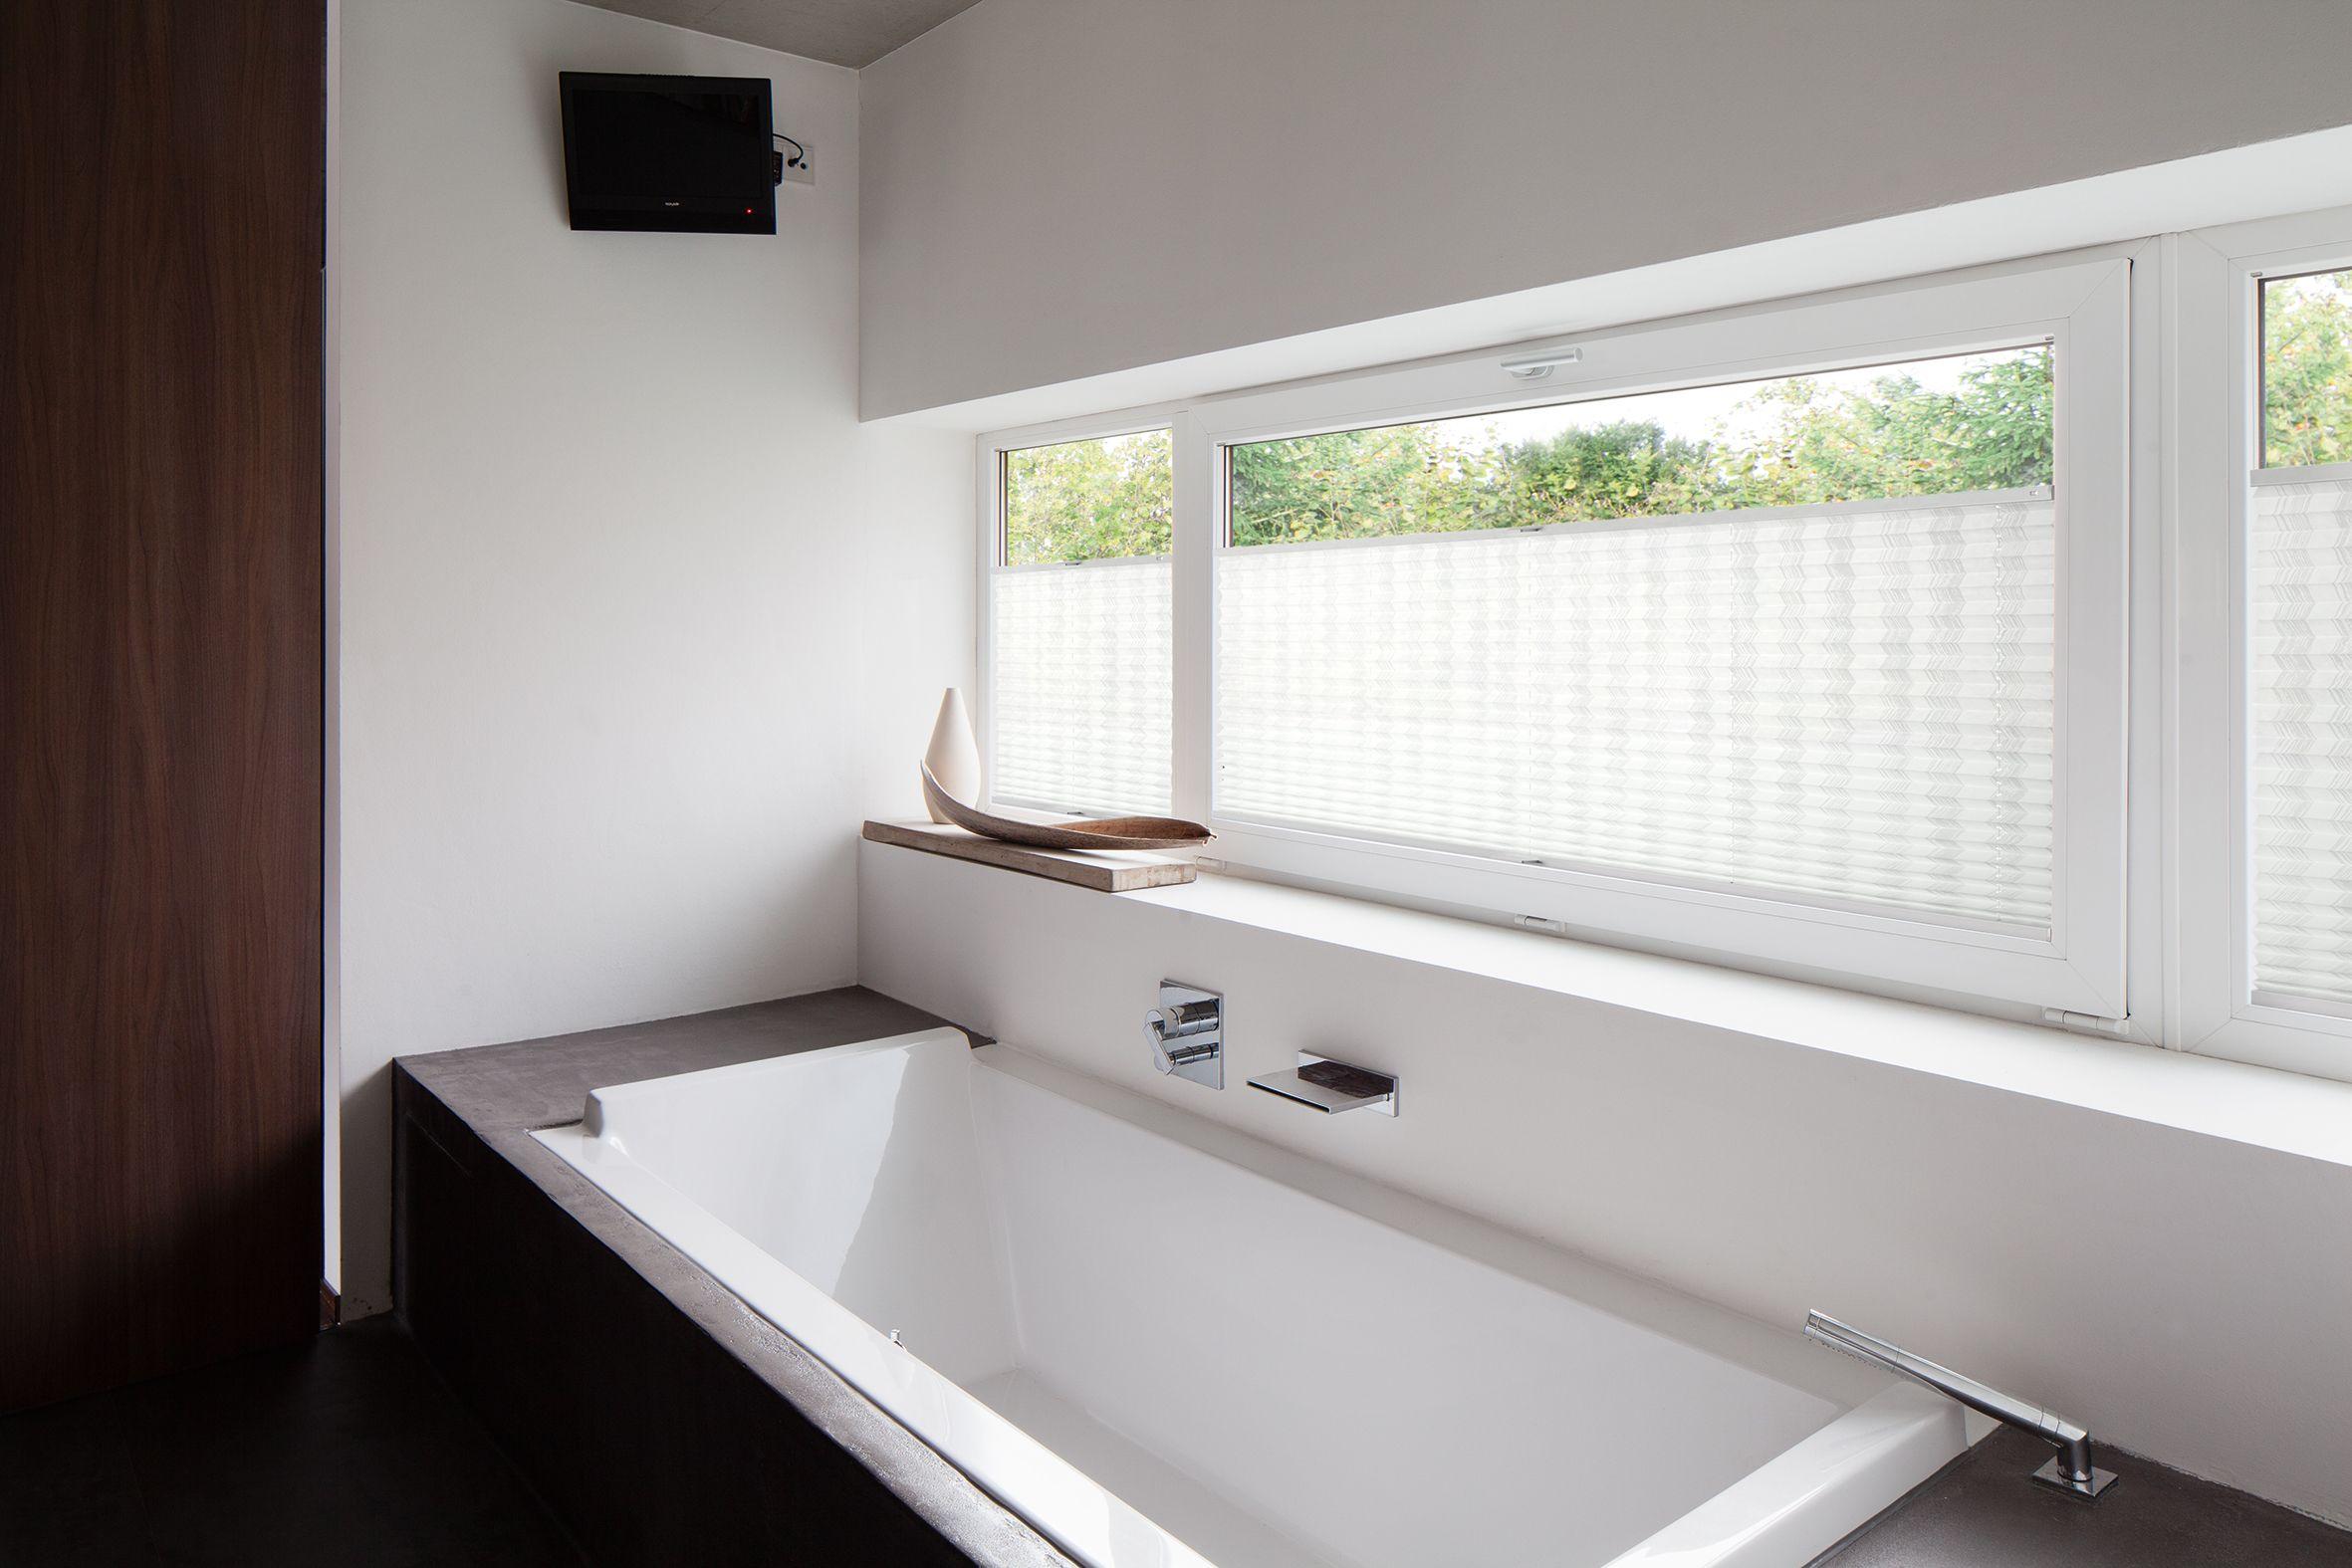 MHZ-Plissee  Plissee vorhänge, Badezimmer, Plissee